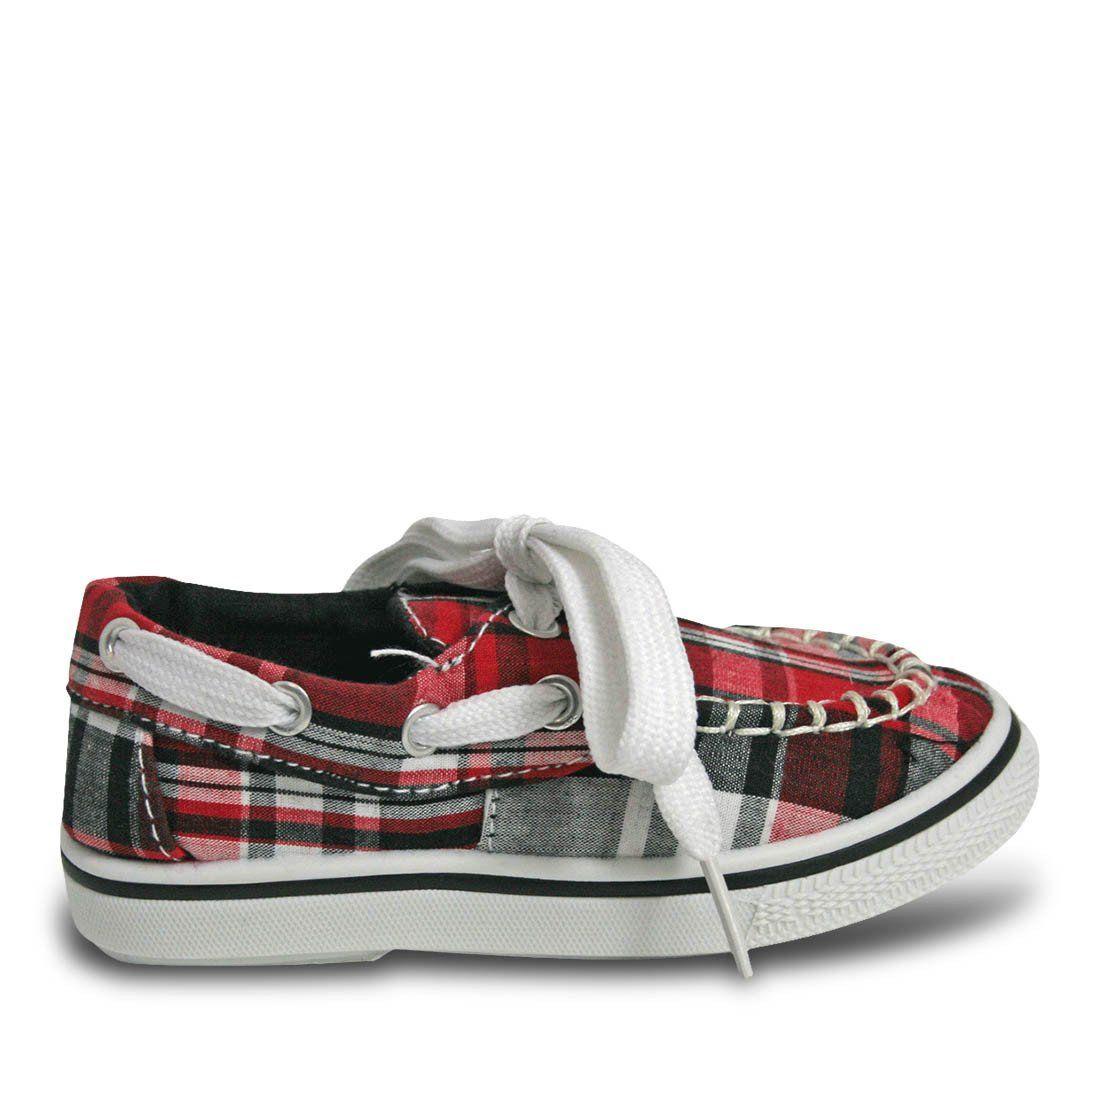 183e3cbdb86 Girls  Kaymann Boat Shoes - Red Plaid